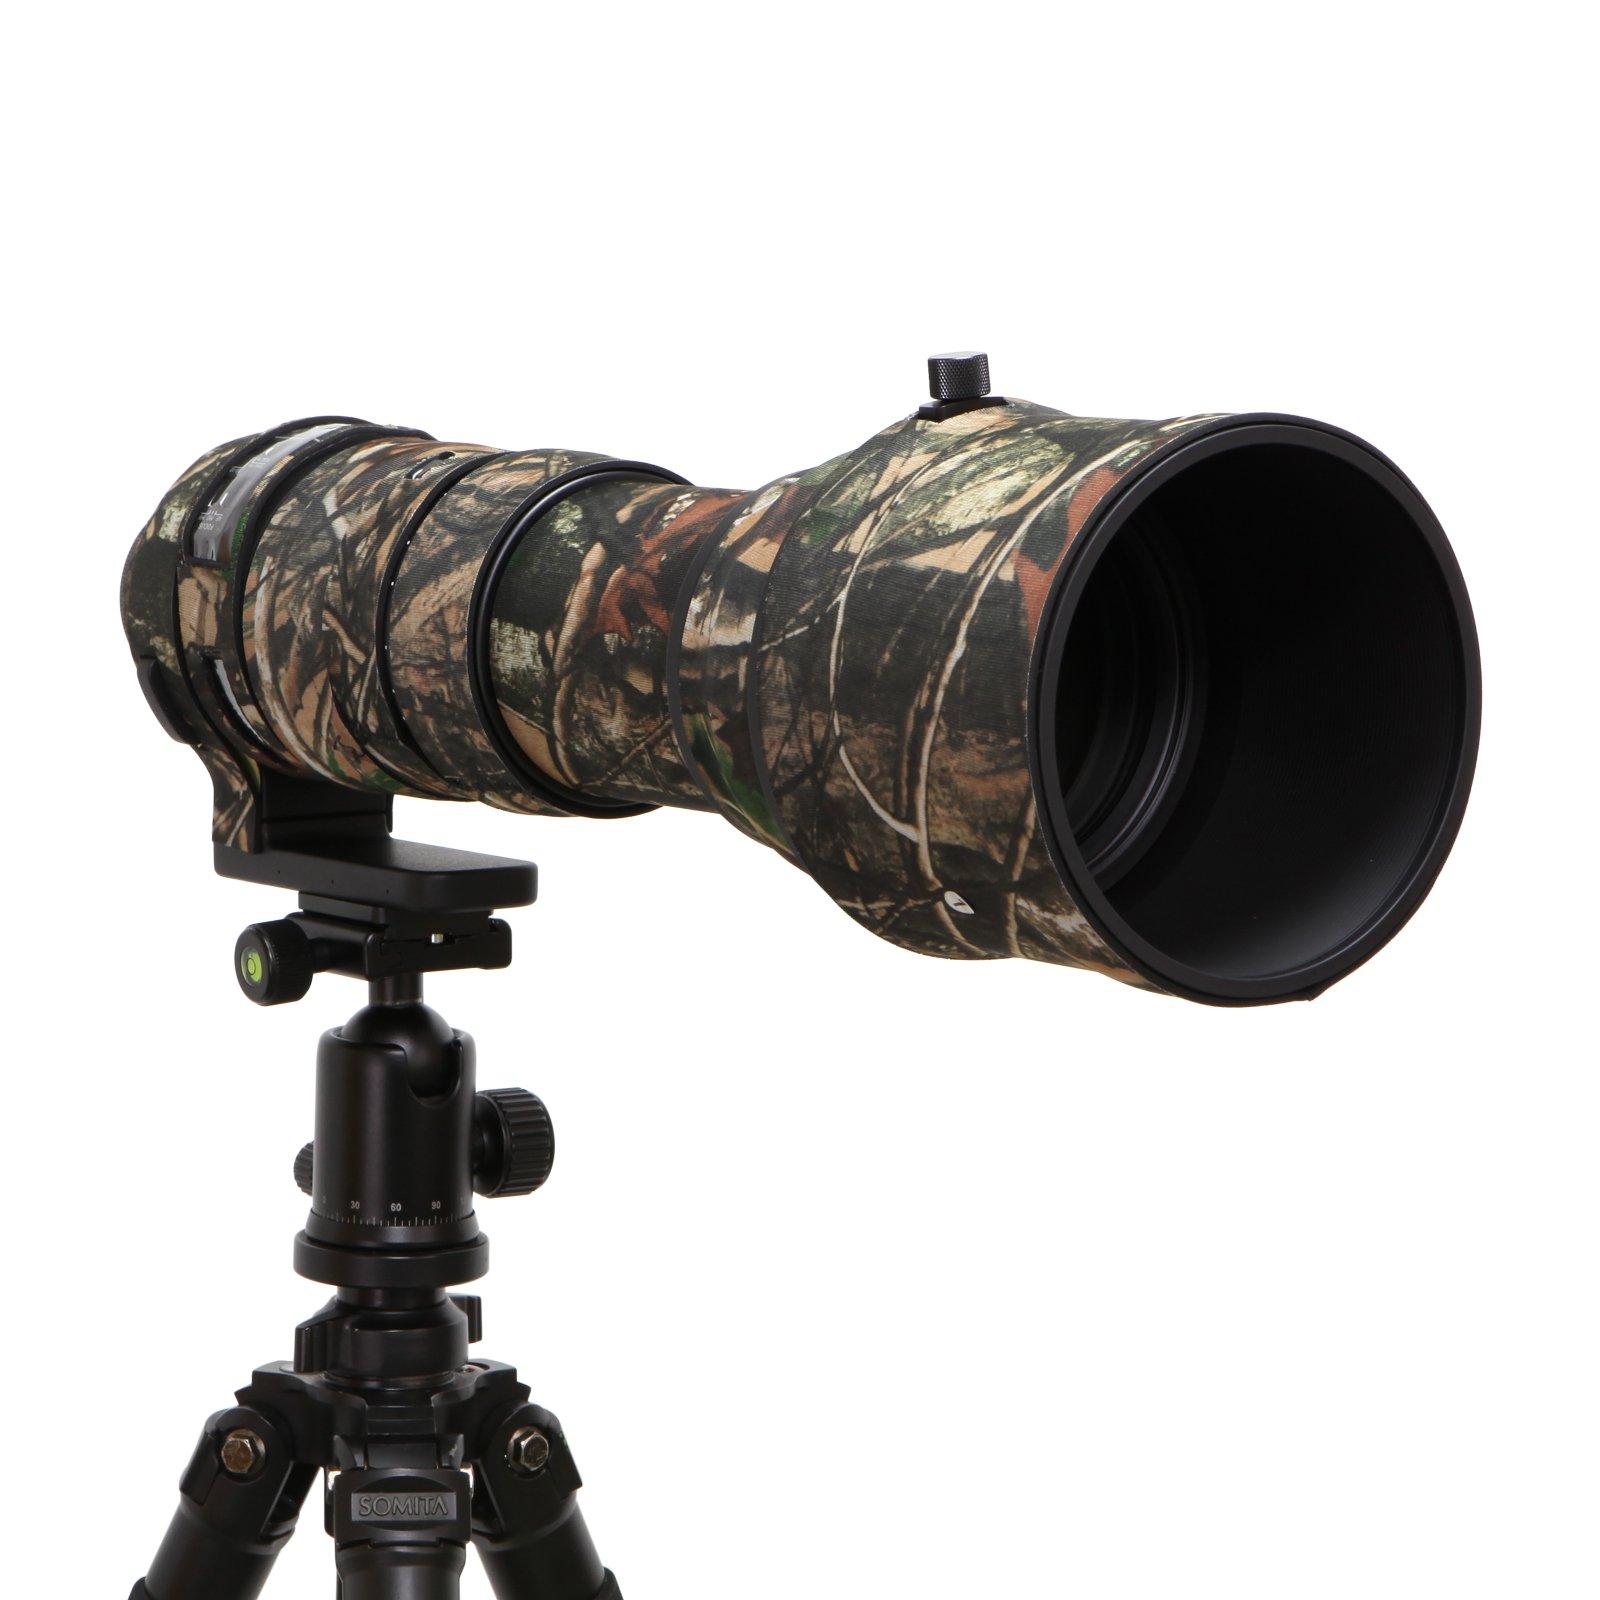 Mekingstudio Sigma 150-600mm Sport Rubber Camera Lens Cover Protective Cover Camo Rain Cover - Forest Green Camo by Mekingstudio